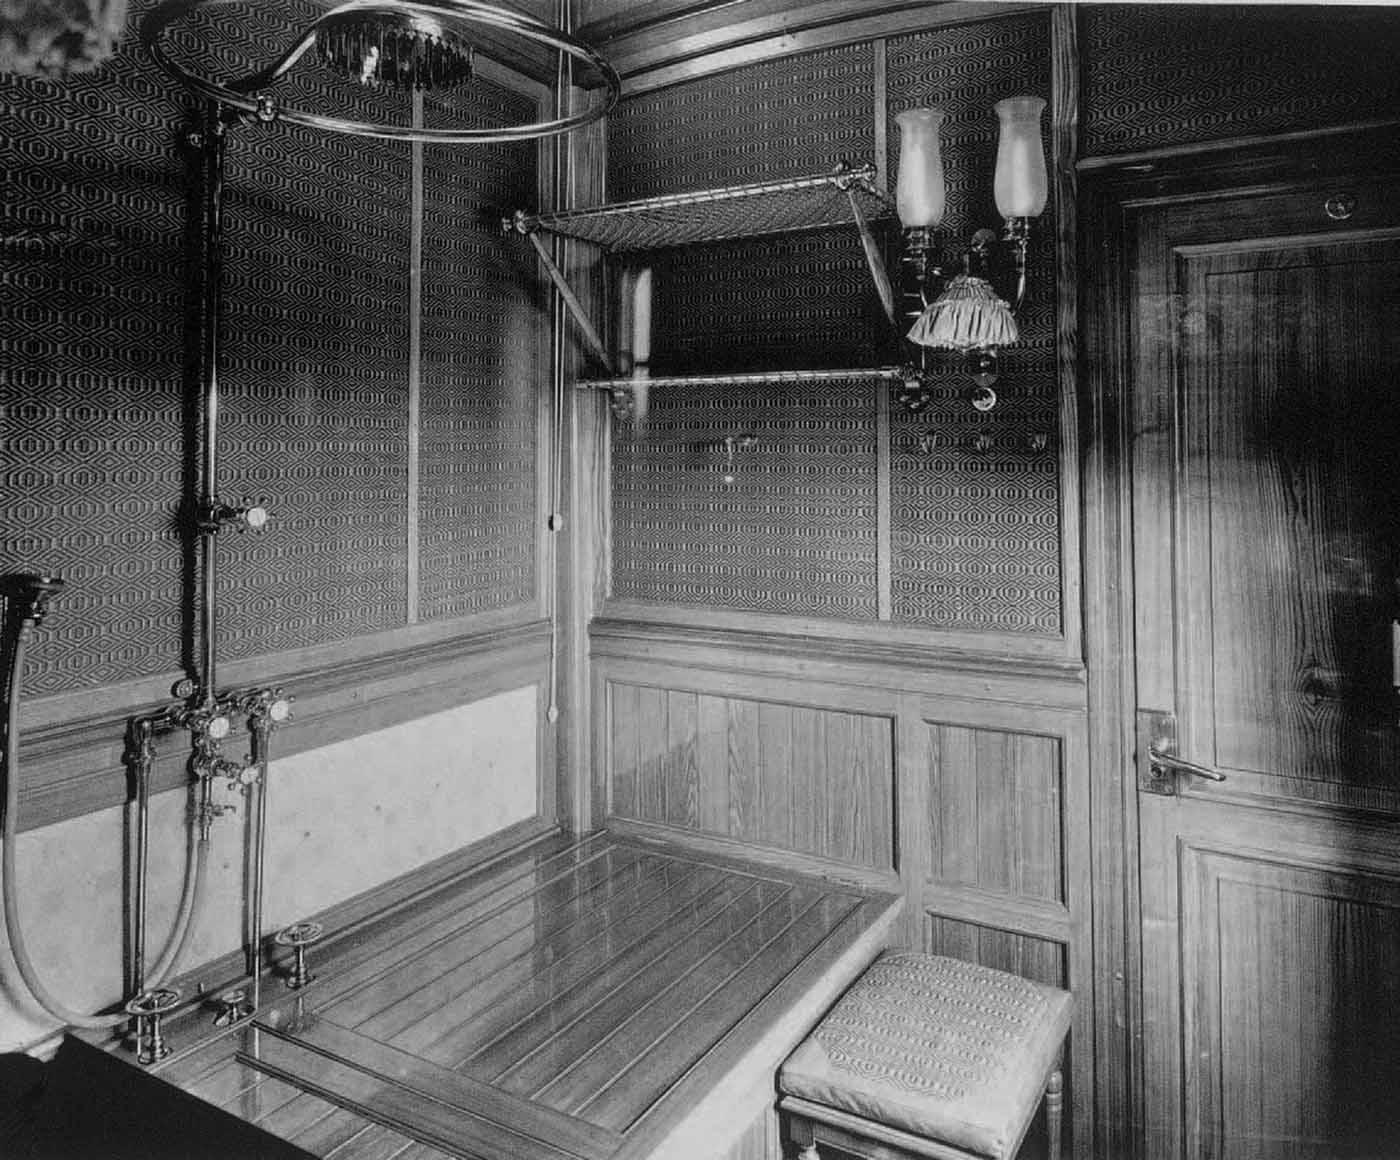 Inside Romanovs Imperial Train 1890s1900s